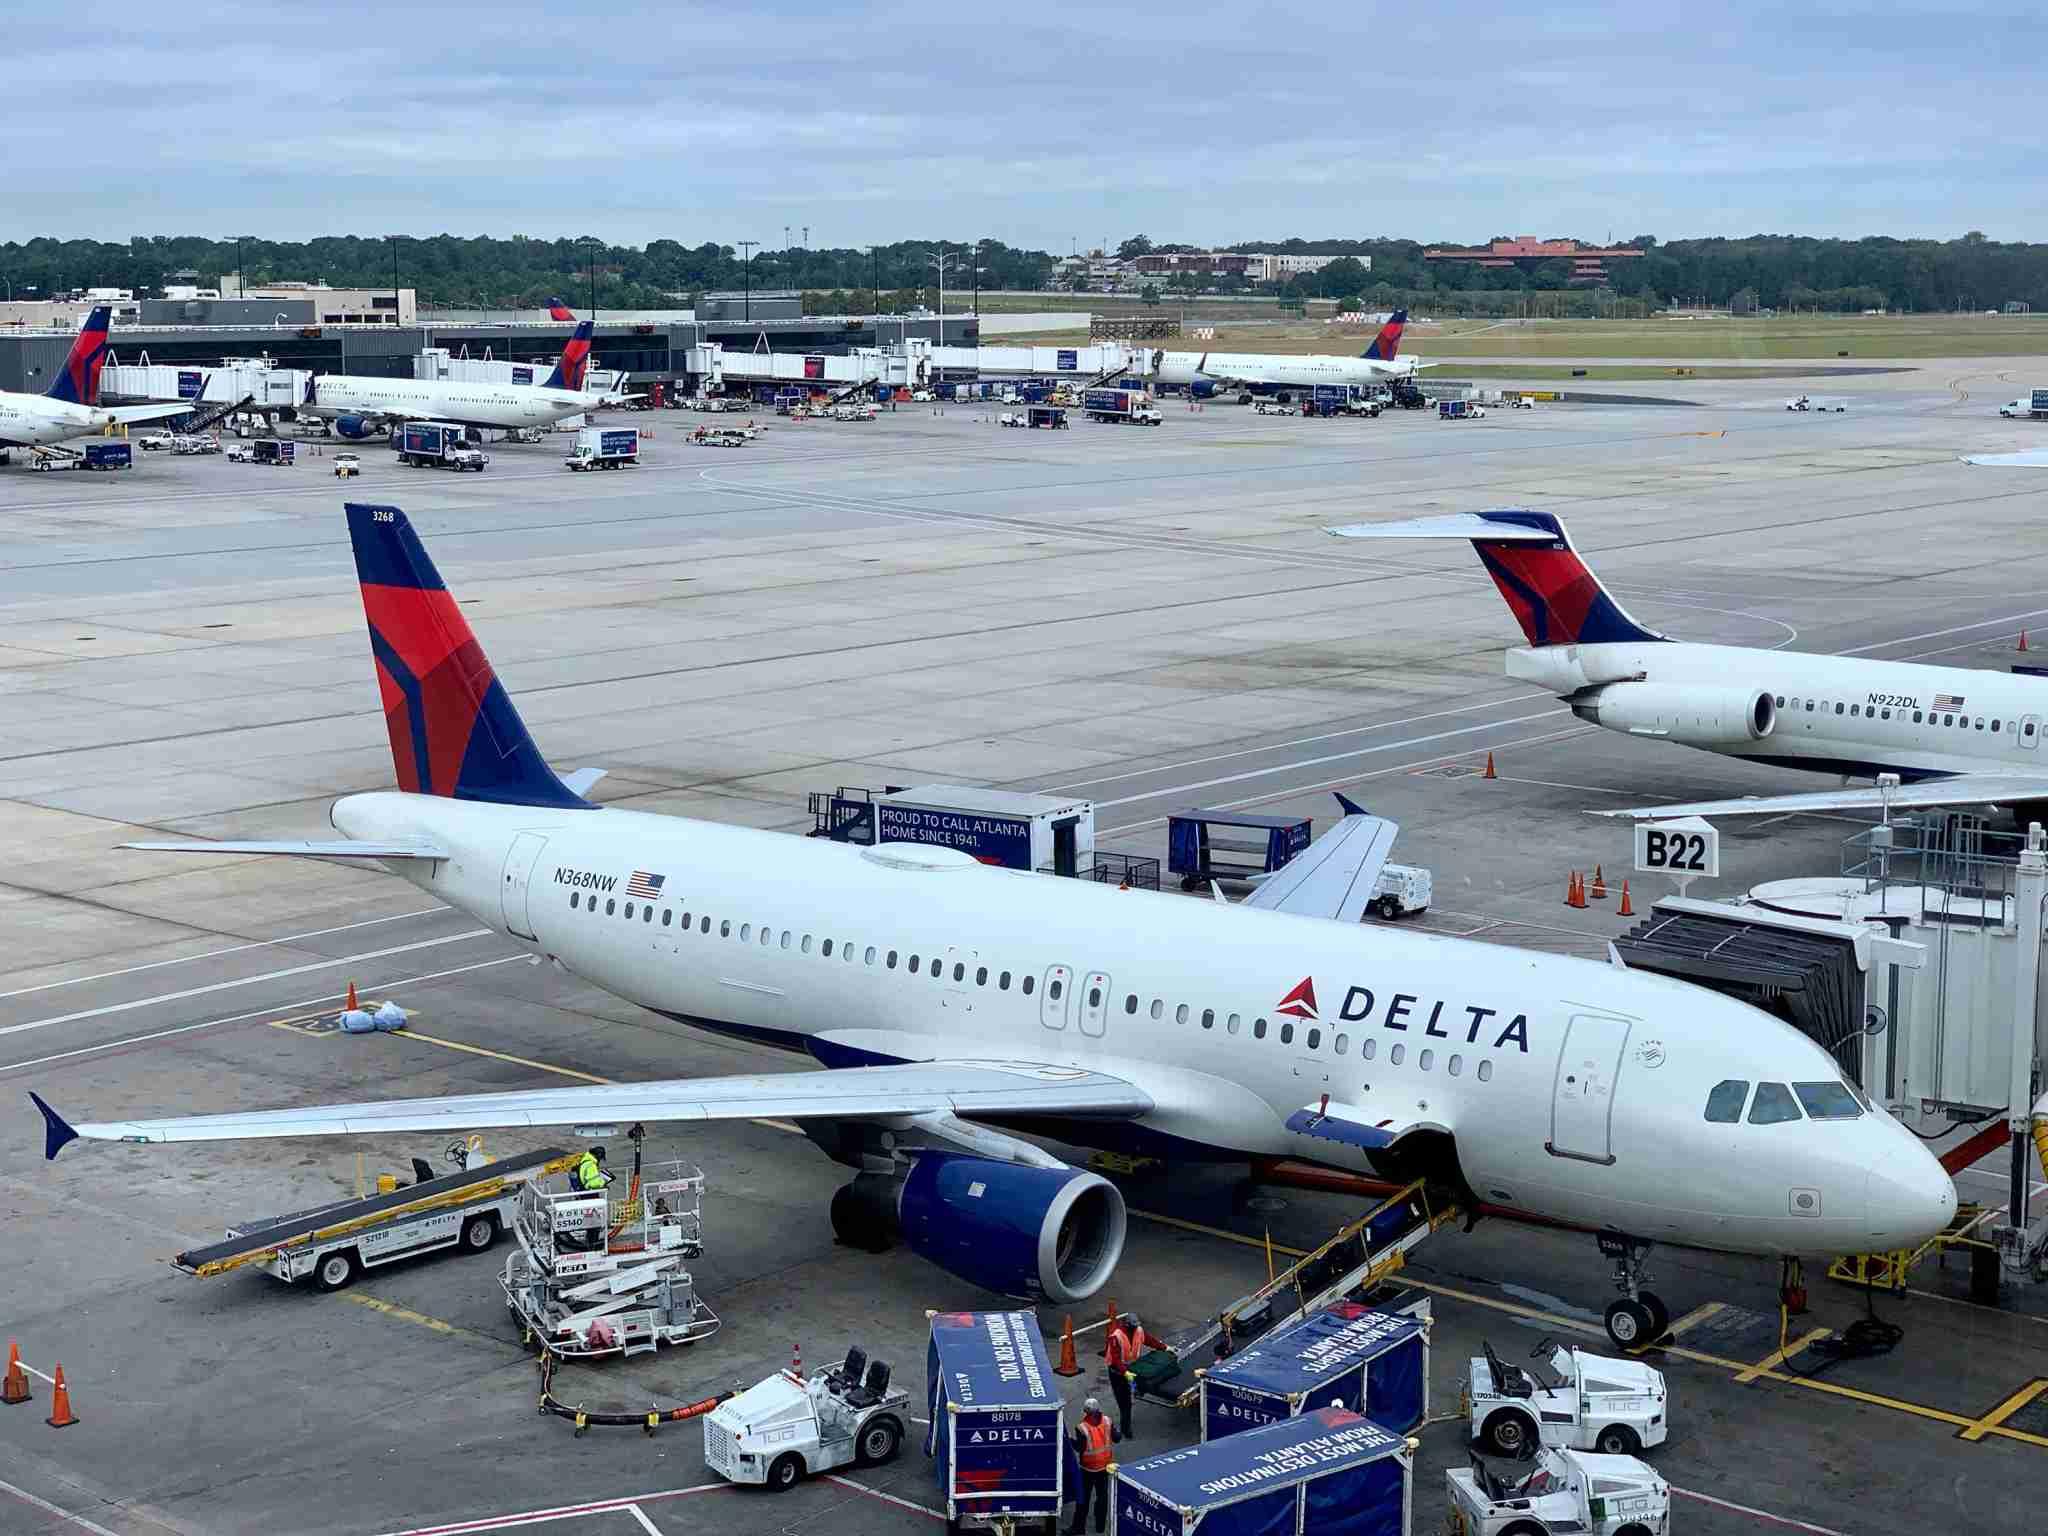 delta-jets-planes-plane-airplane-atlanta-atl-jet